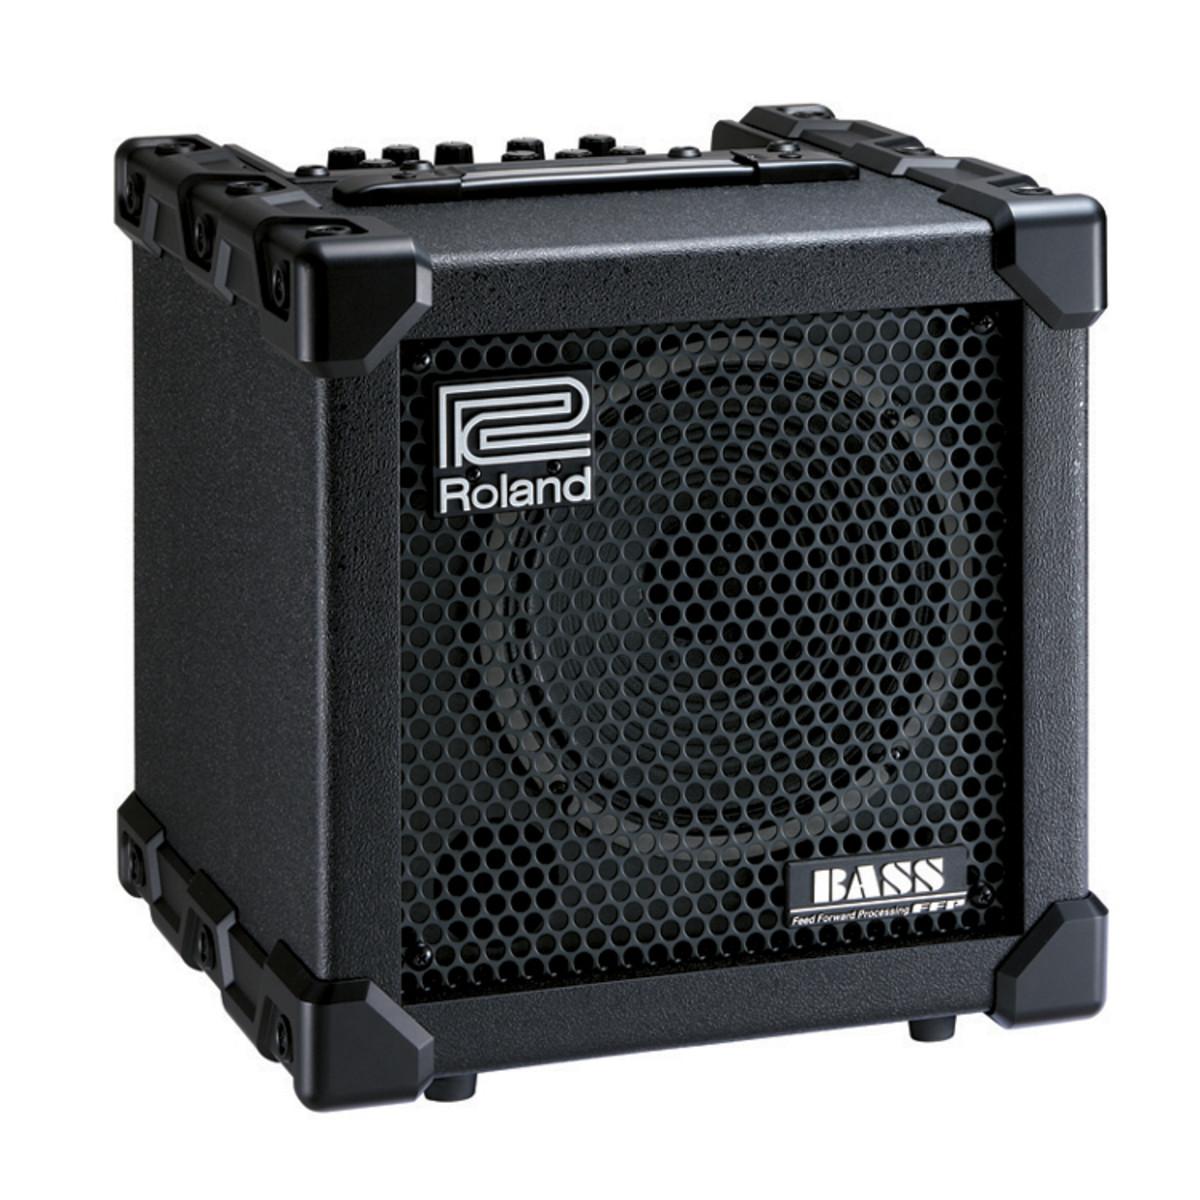 roland cube 20 xl bass amp at. Black Bedroom Furniture Sets. Home Design Ideas